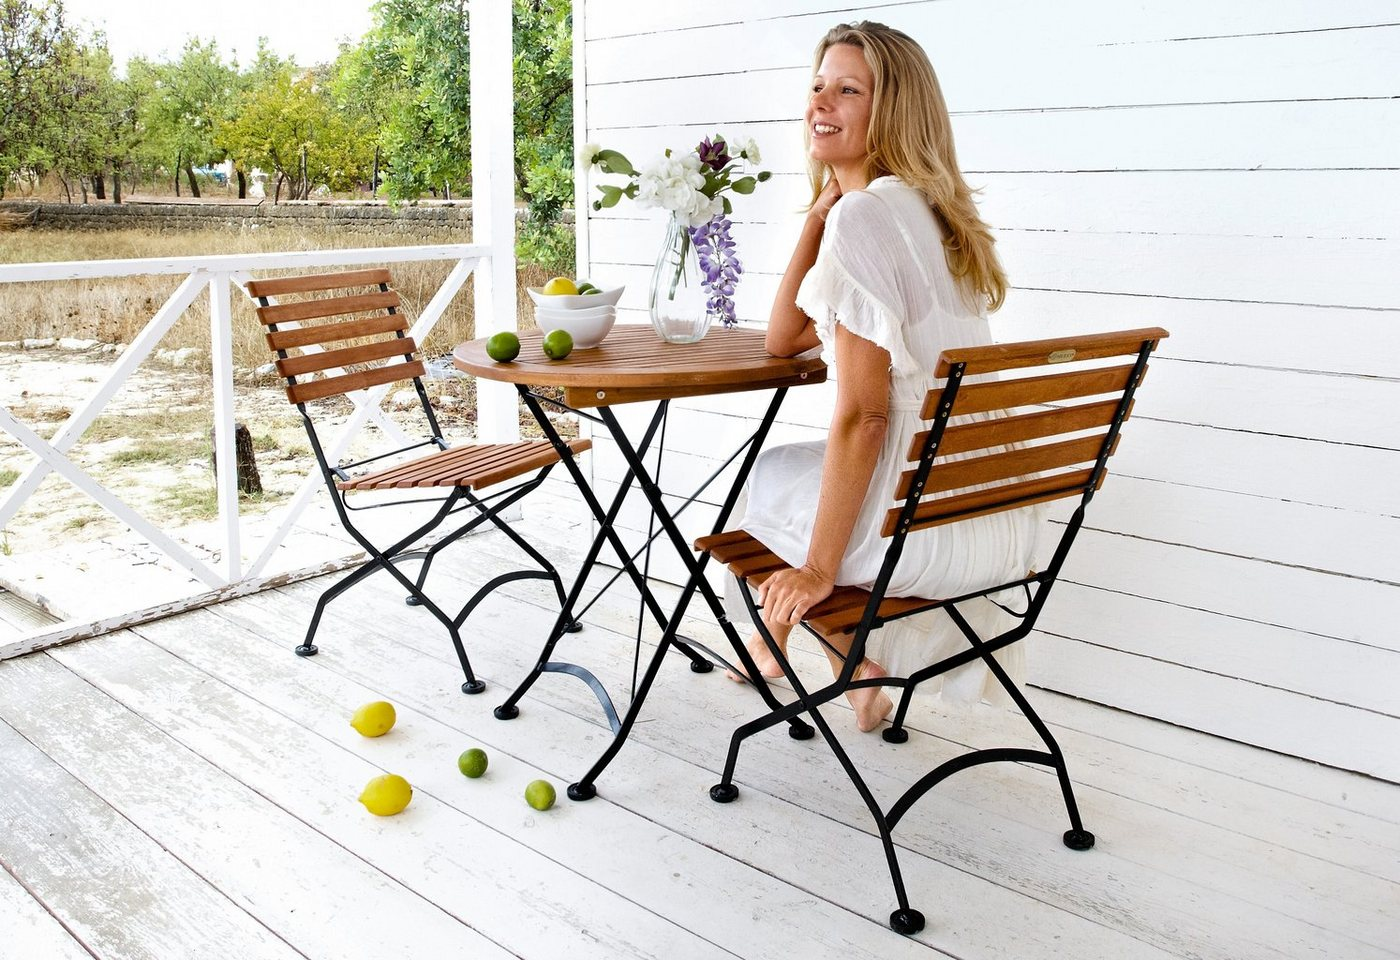 Tuinmeubelset Kasteeltuin, 2 stoelen, tafel Ø 70 cm, staal/eucalyptushout